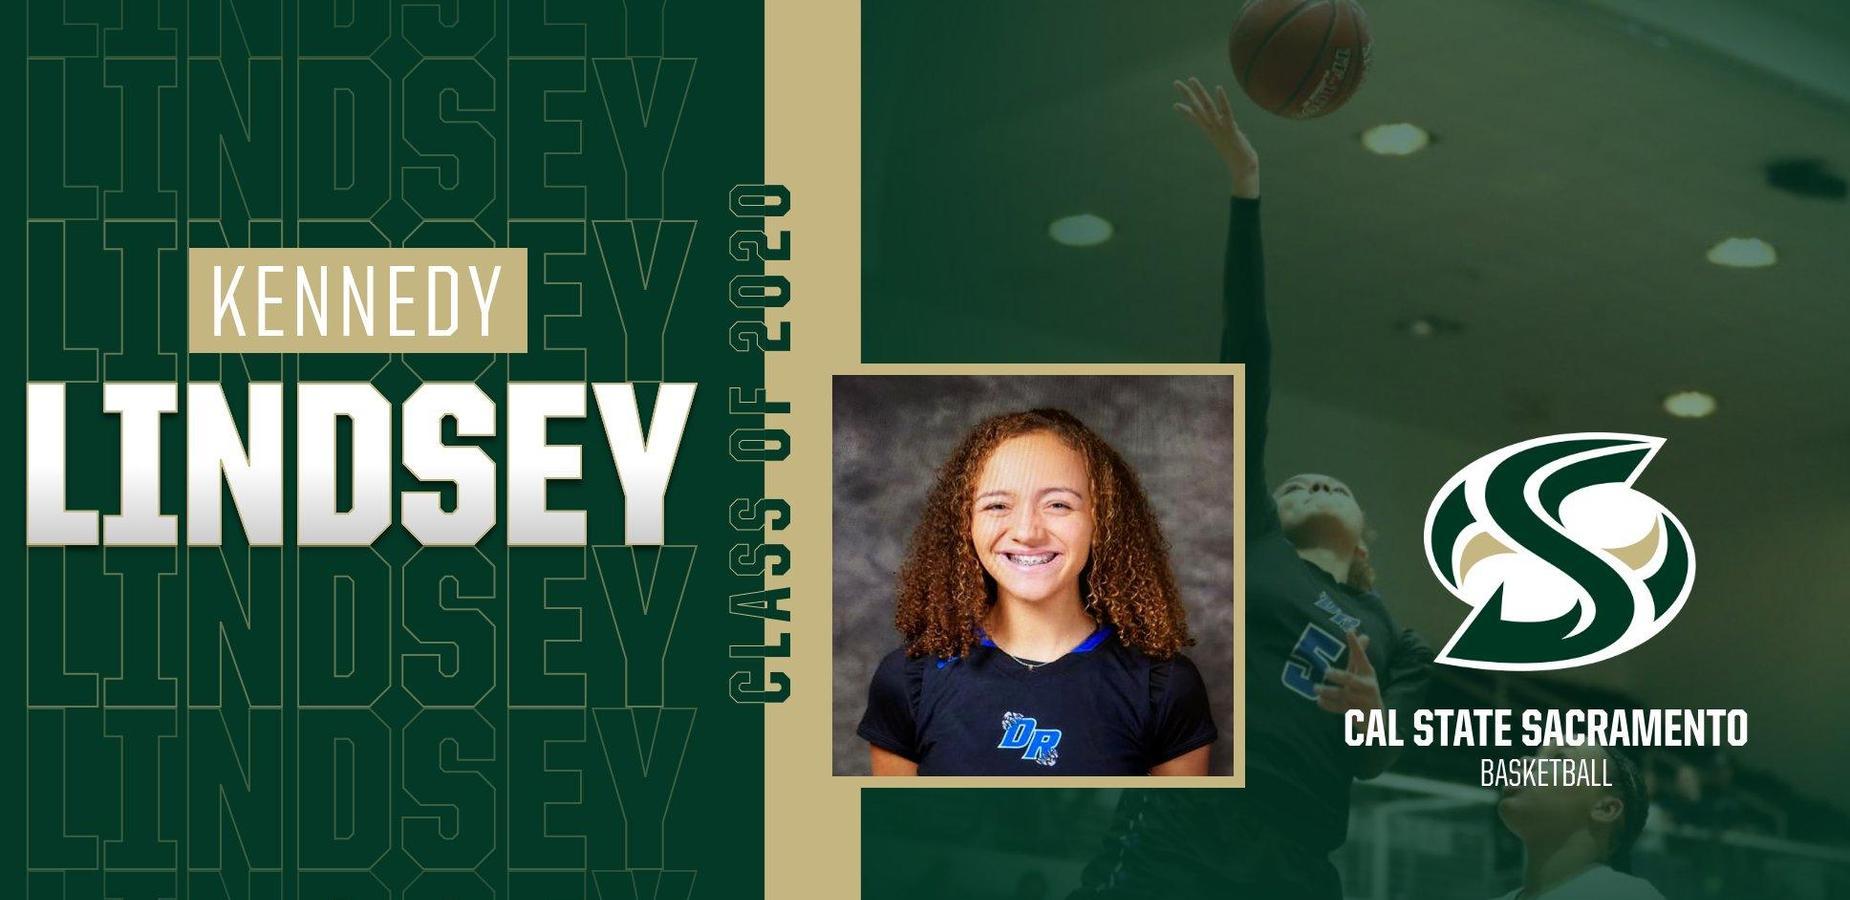 Kennedy Lindsey